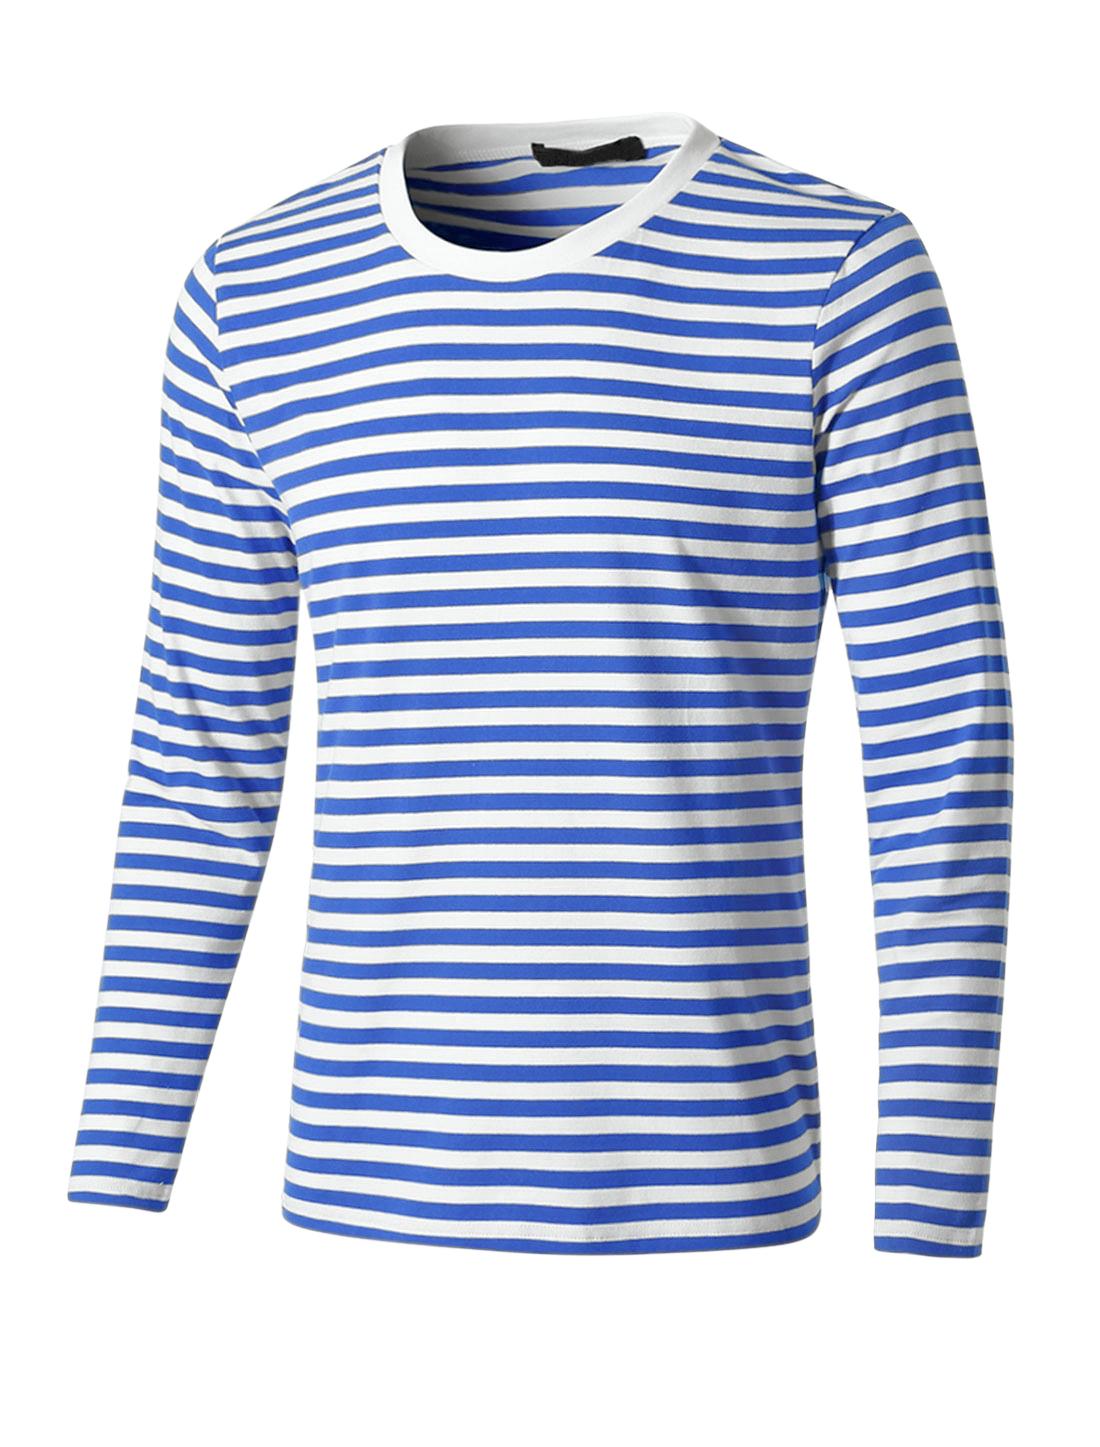 Men Crew Neck Long Sleeve Striped Tee T Shirt Blue S S (US 34)